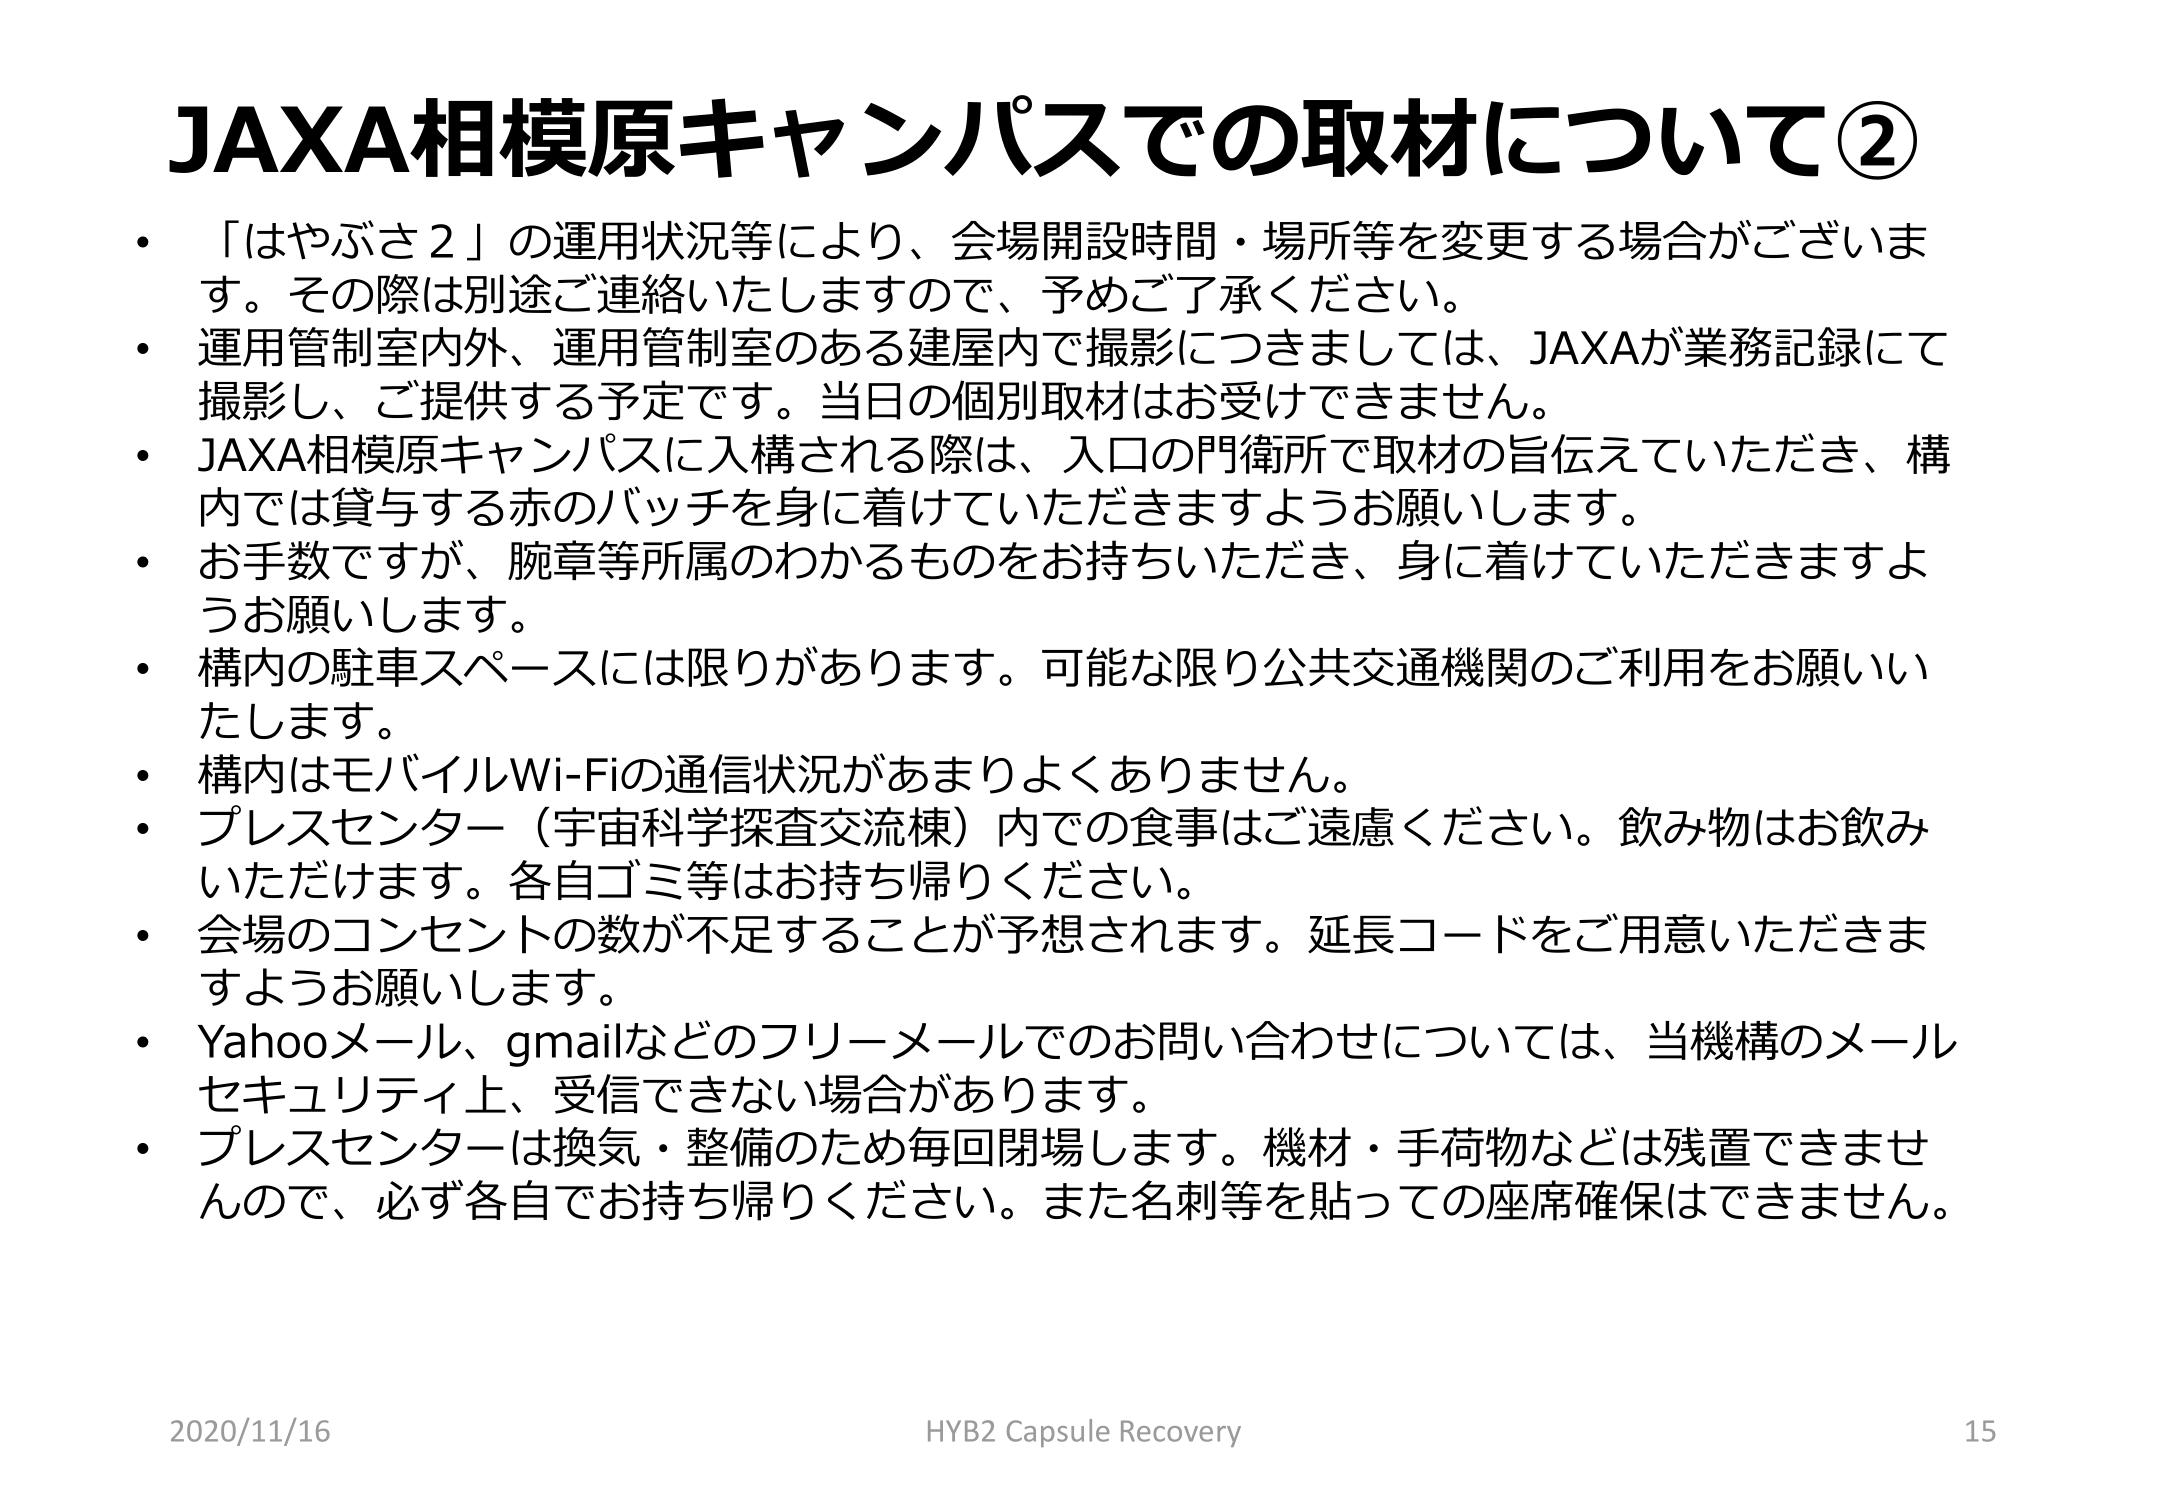 f:id:Imamura:20201117222335p:plain